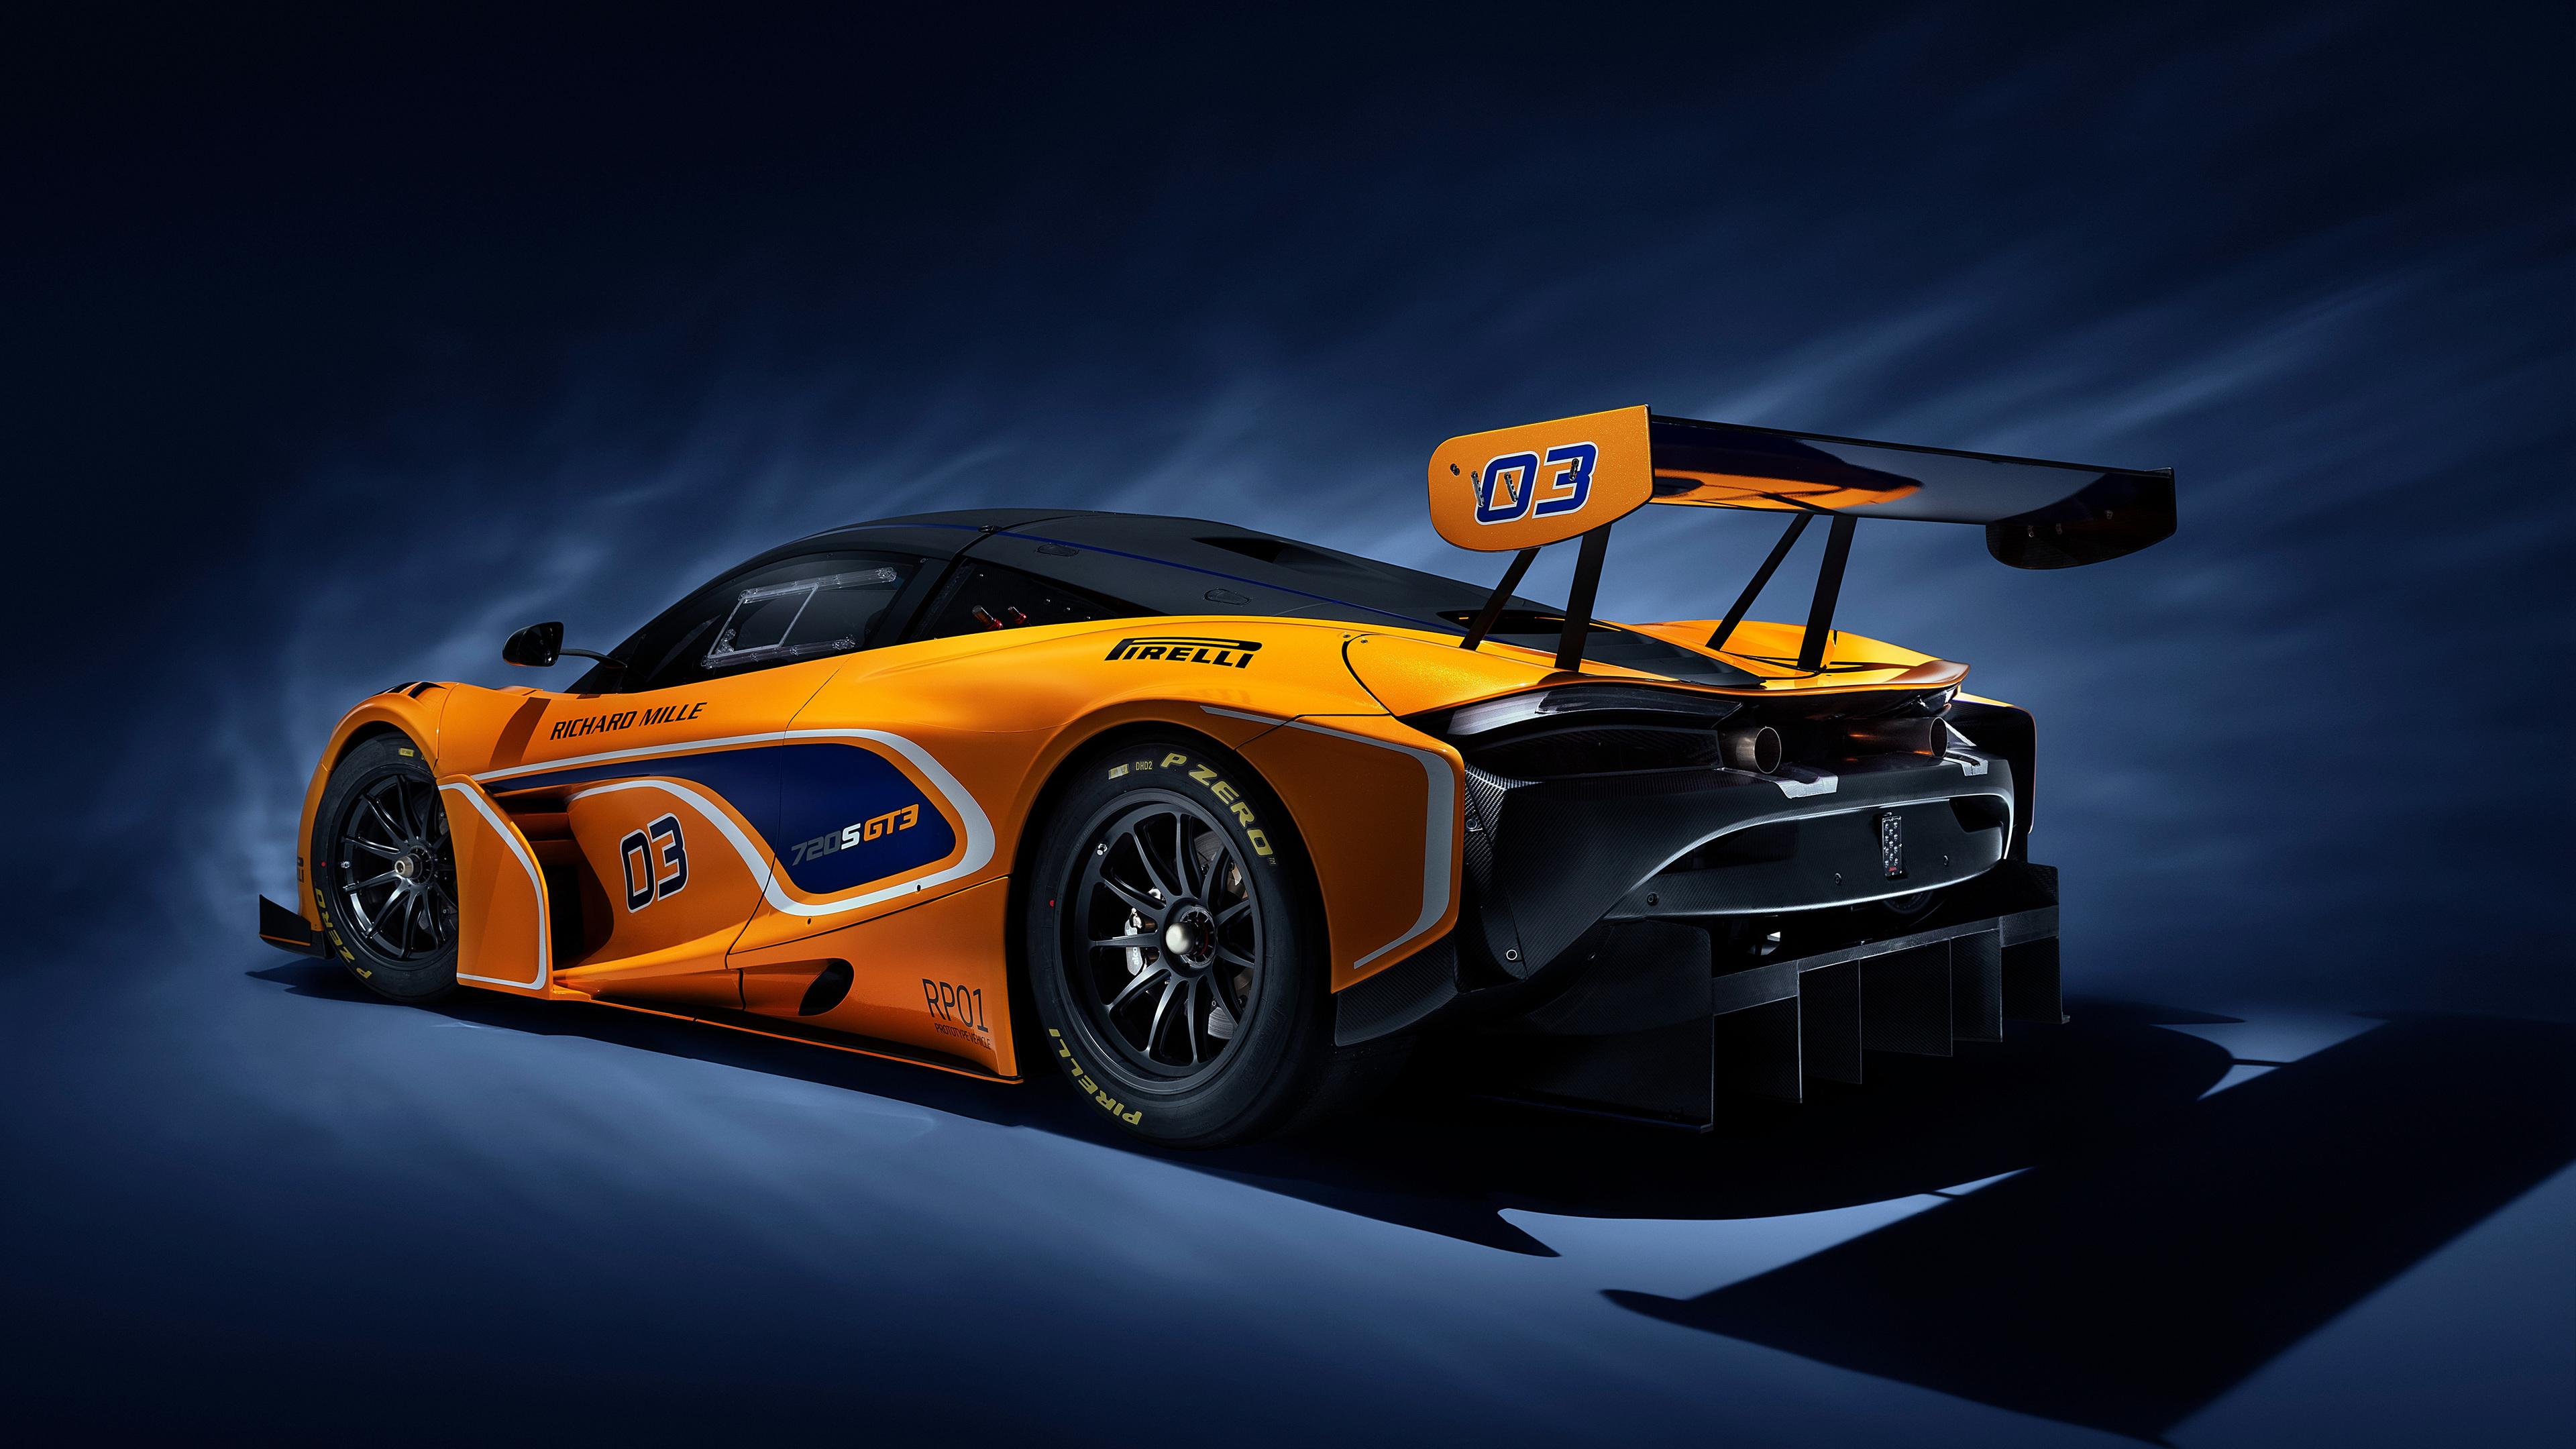 mclaren 720s gt3 2019 rear 1539113939 - McLaren 720S GT3 2019 Rear - mclaren wallpapers, mclaren 720s wallpapers, mclaren 720s gt3 wallpapers, hd-wallpapers, cars wallpapers, 4k-wallpapers, 2019 cars wallpapers